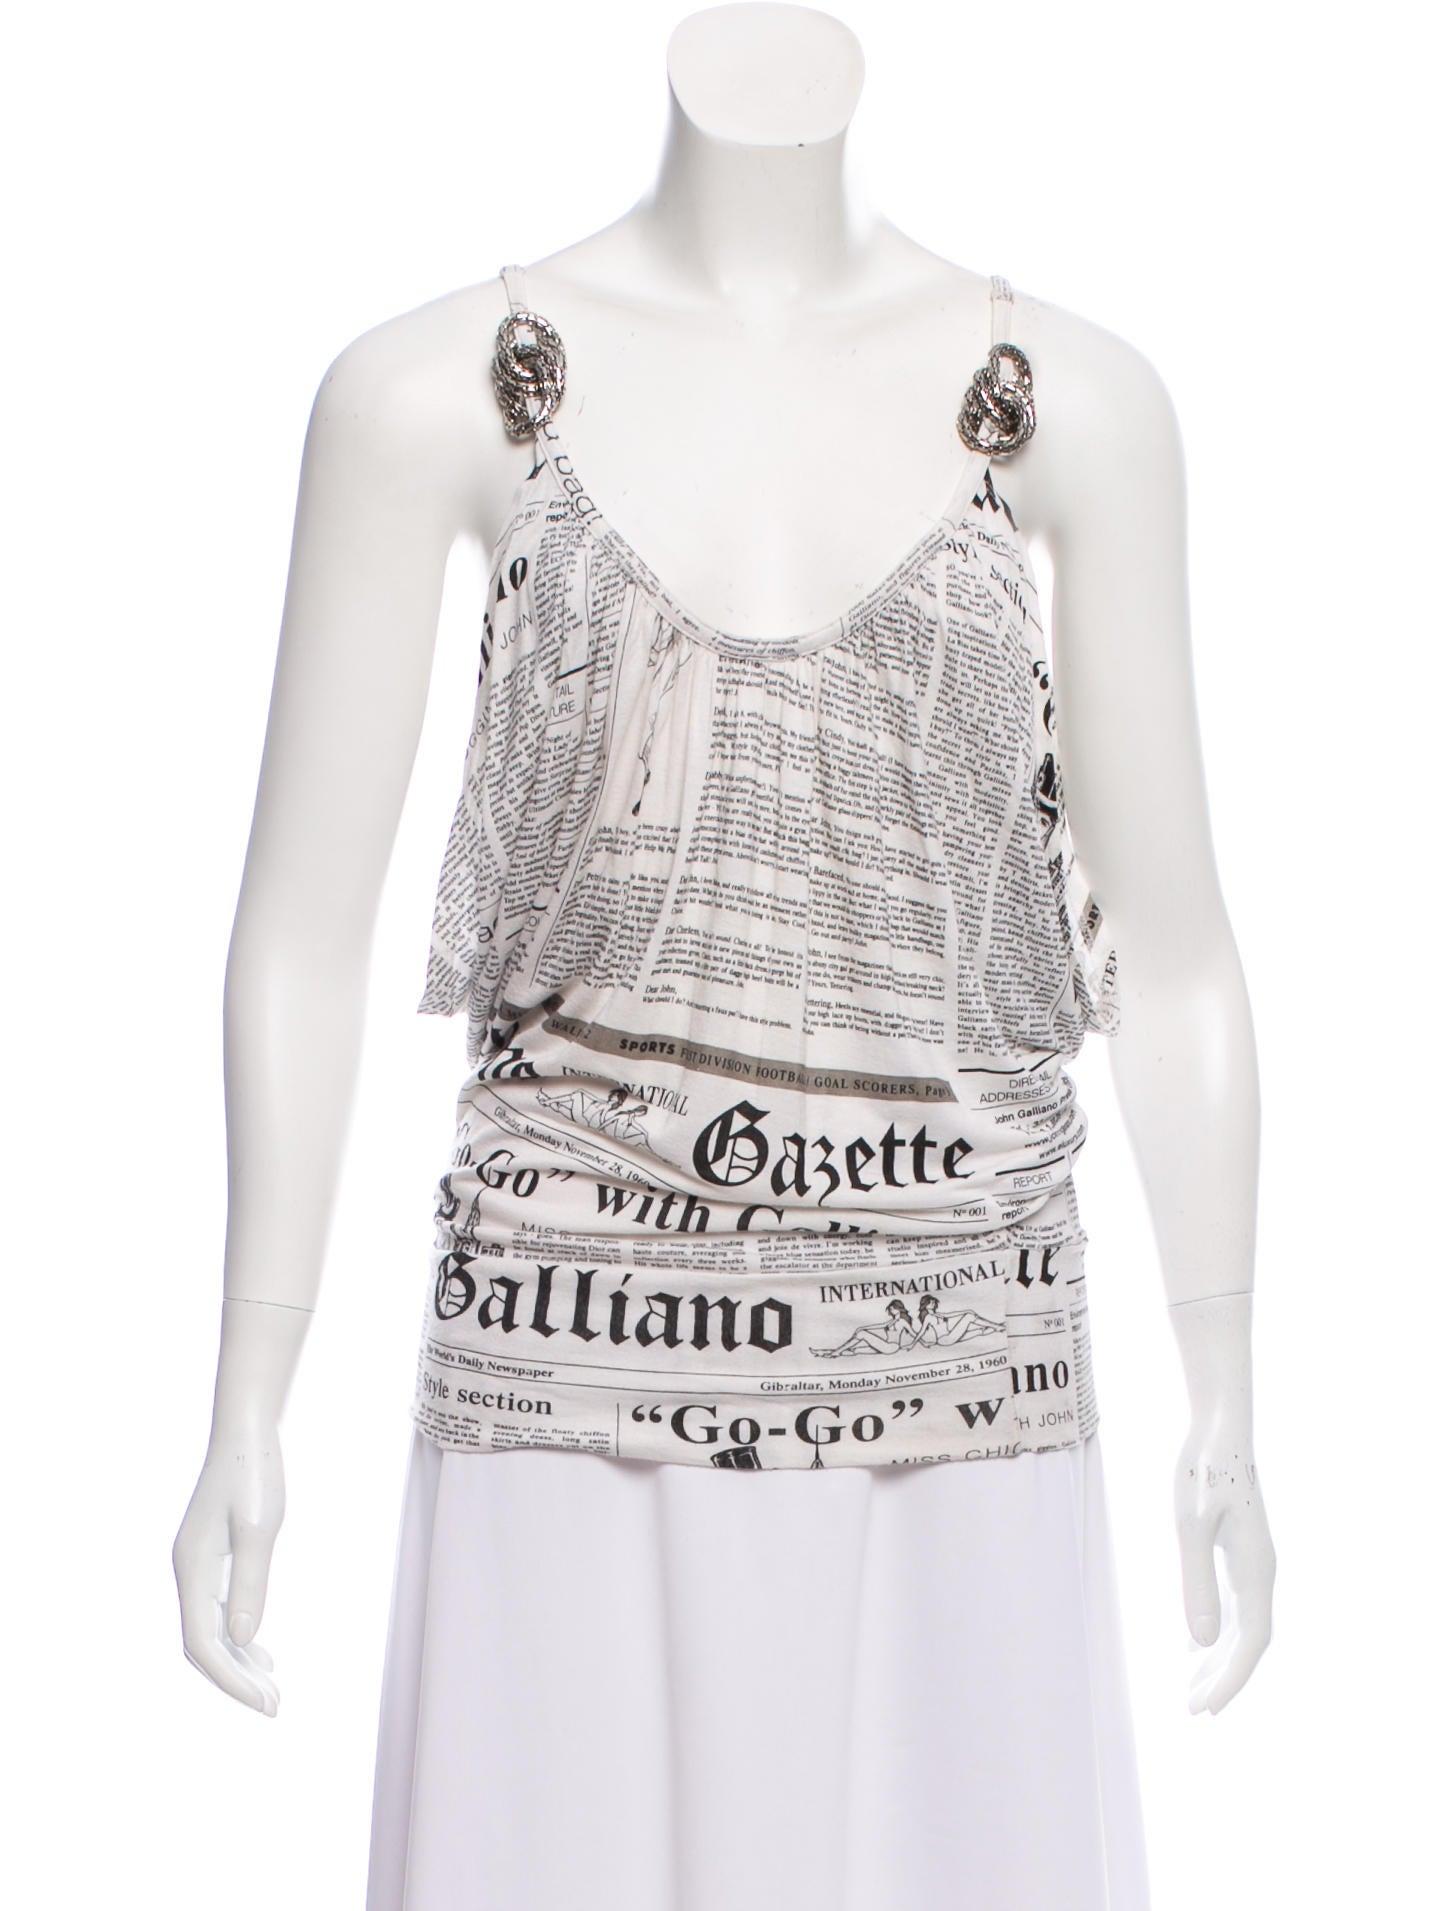 76229bad John Galliano Newspaper Print Sleeveless Top - Clothing - JOH23345 ...